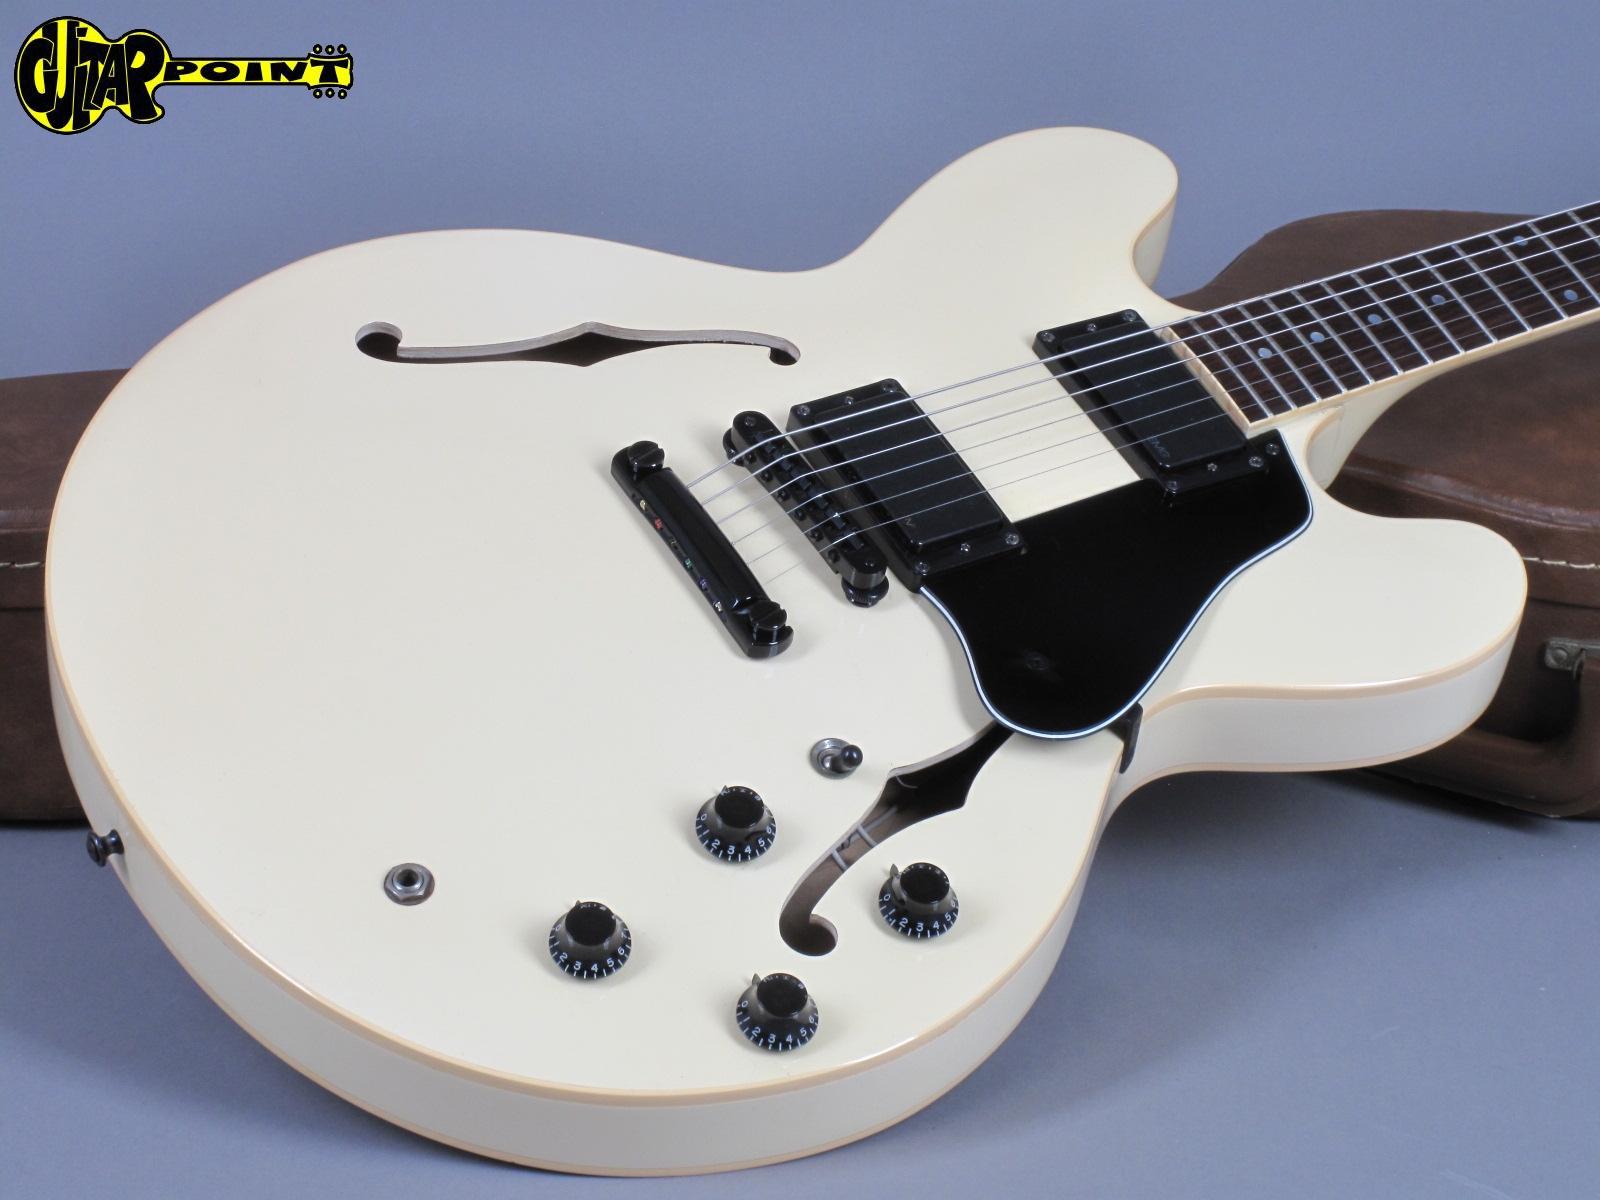 https://guitarpoint.de/app/uploads/products/1988-gibson-es-335-sc-white-showcase-edition-limited-1-of-200/Gibson87ES335White81048565_17.jpg